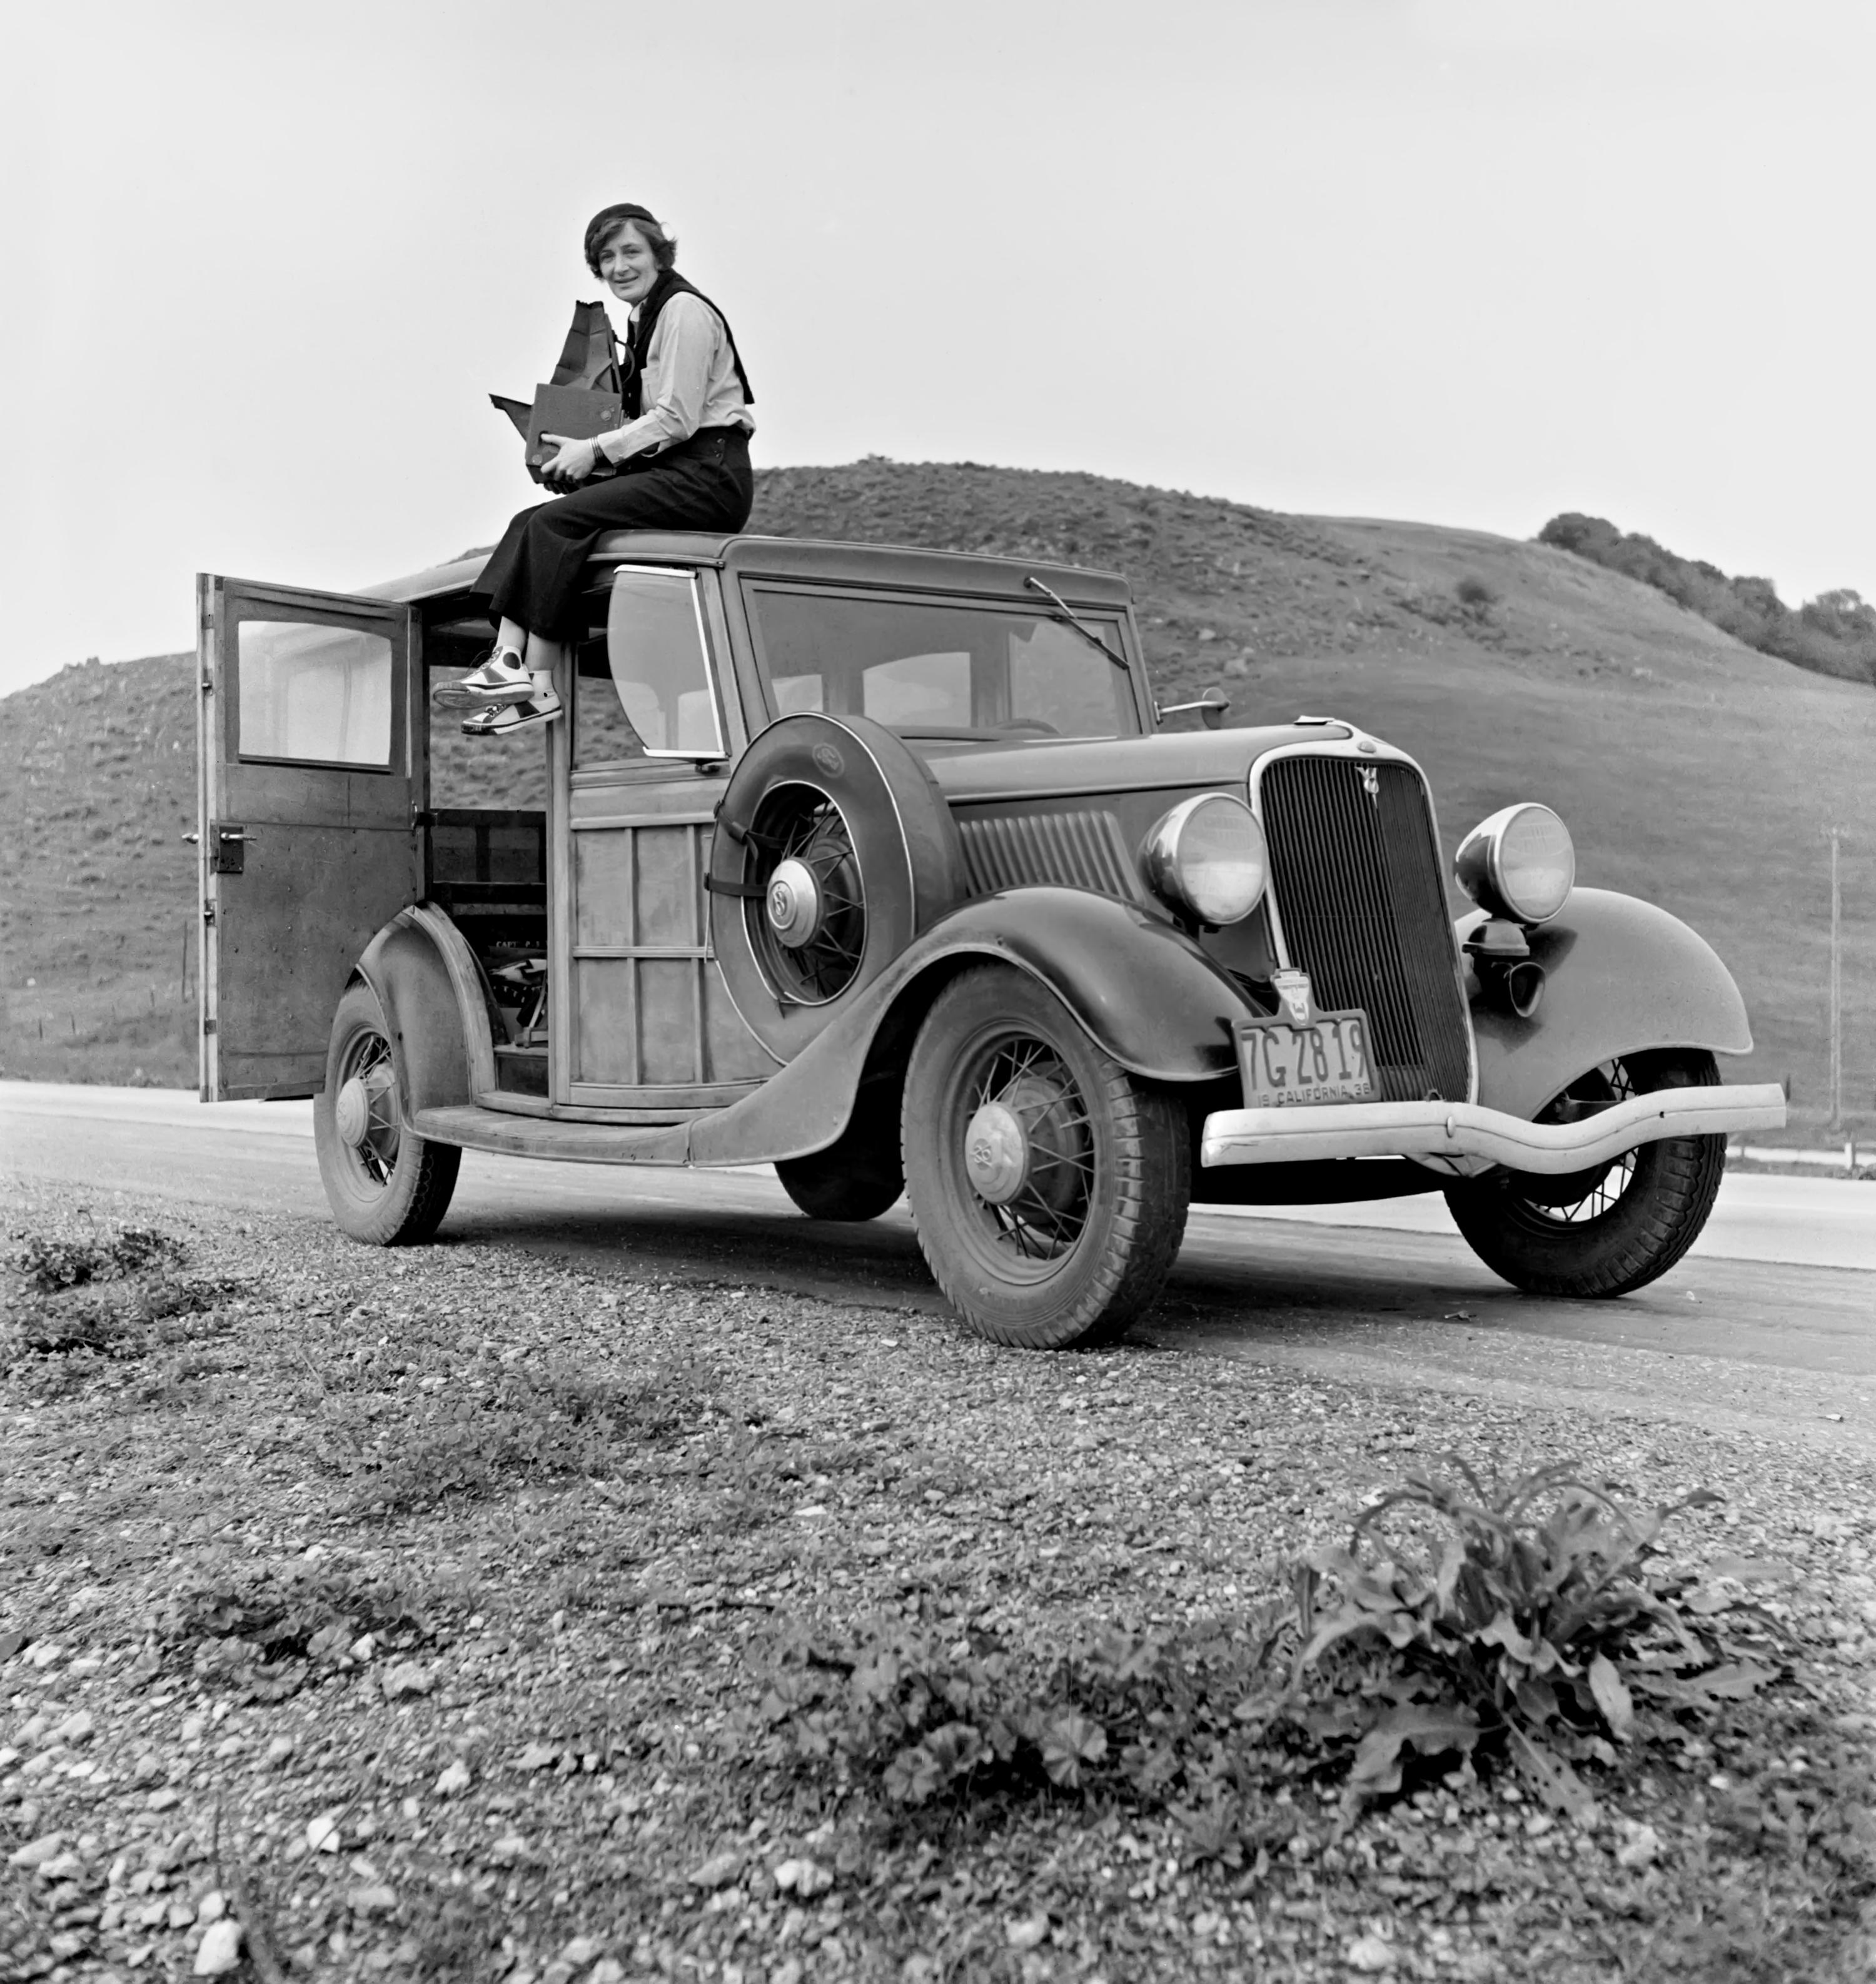 File:Dorothea Lange atop automobile in California.jpg